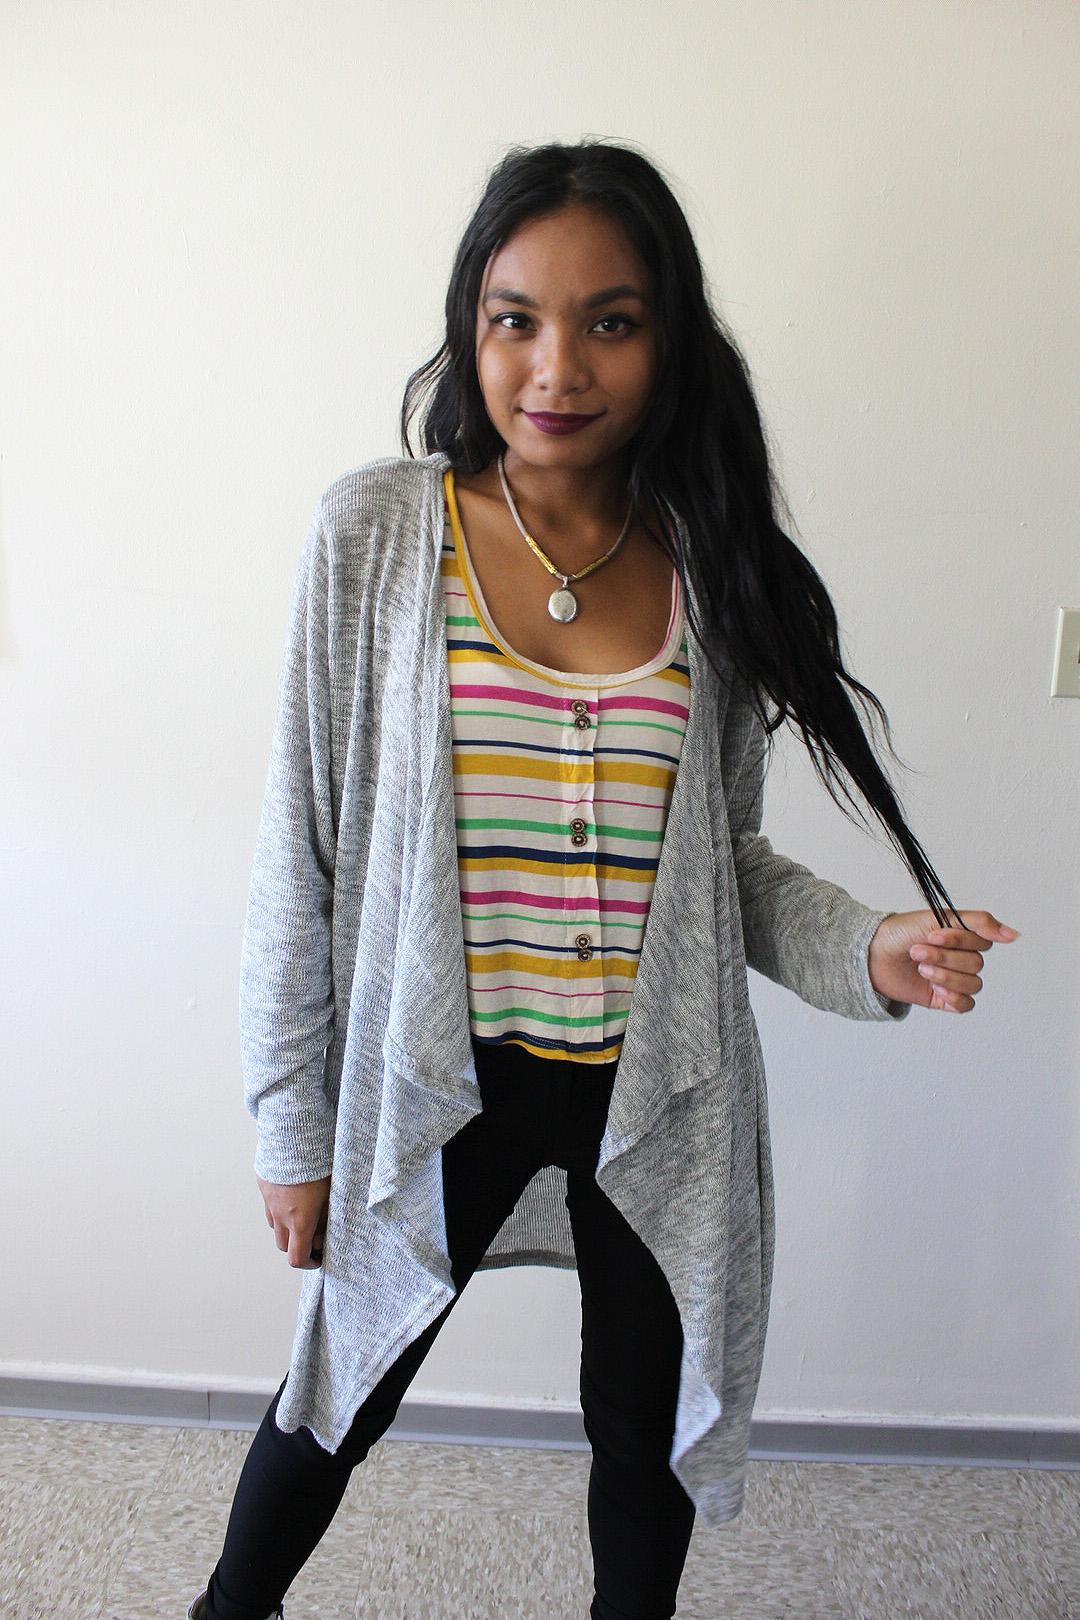 Stripes-Boots-Layering-Fall-Style-Blogger-Fashionista-LINDATENCHITRAN-5-1616x1080